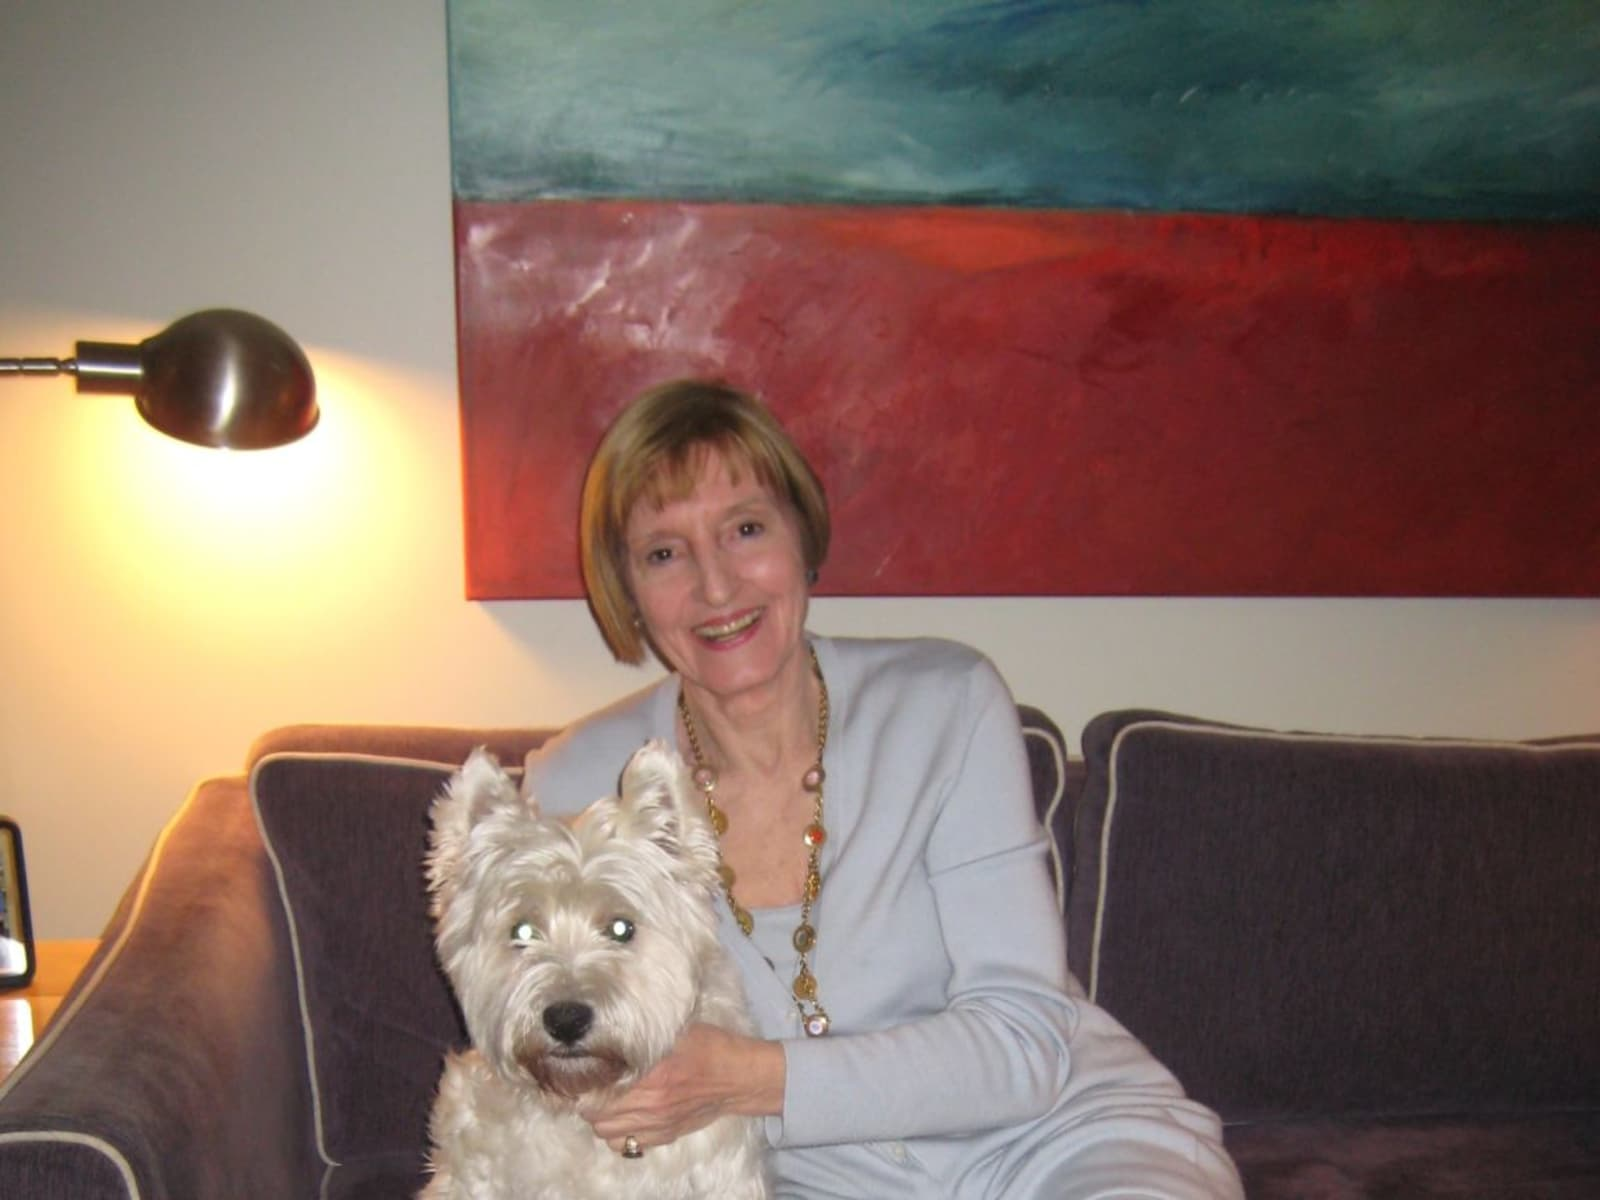 Claudine from Toronto, Ontario, Canada